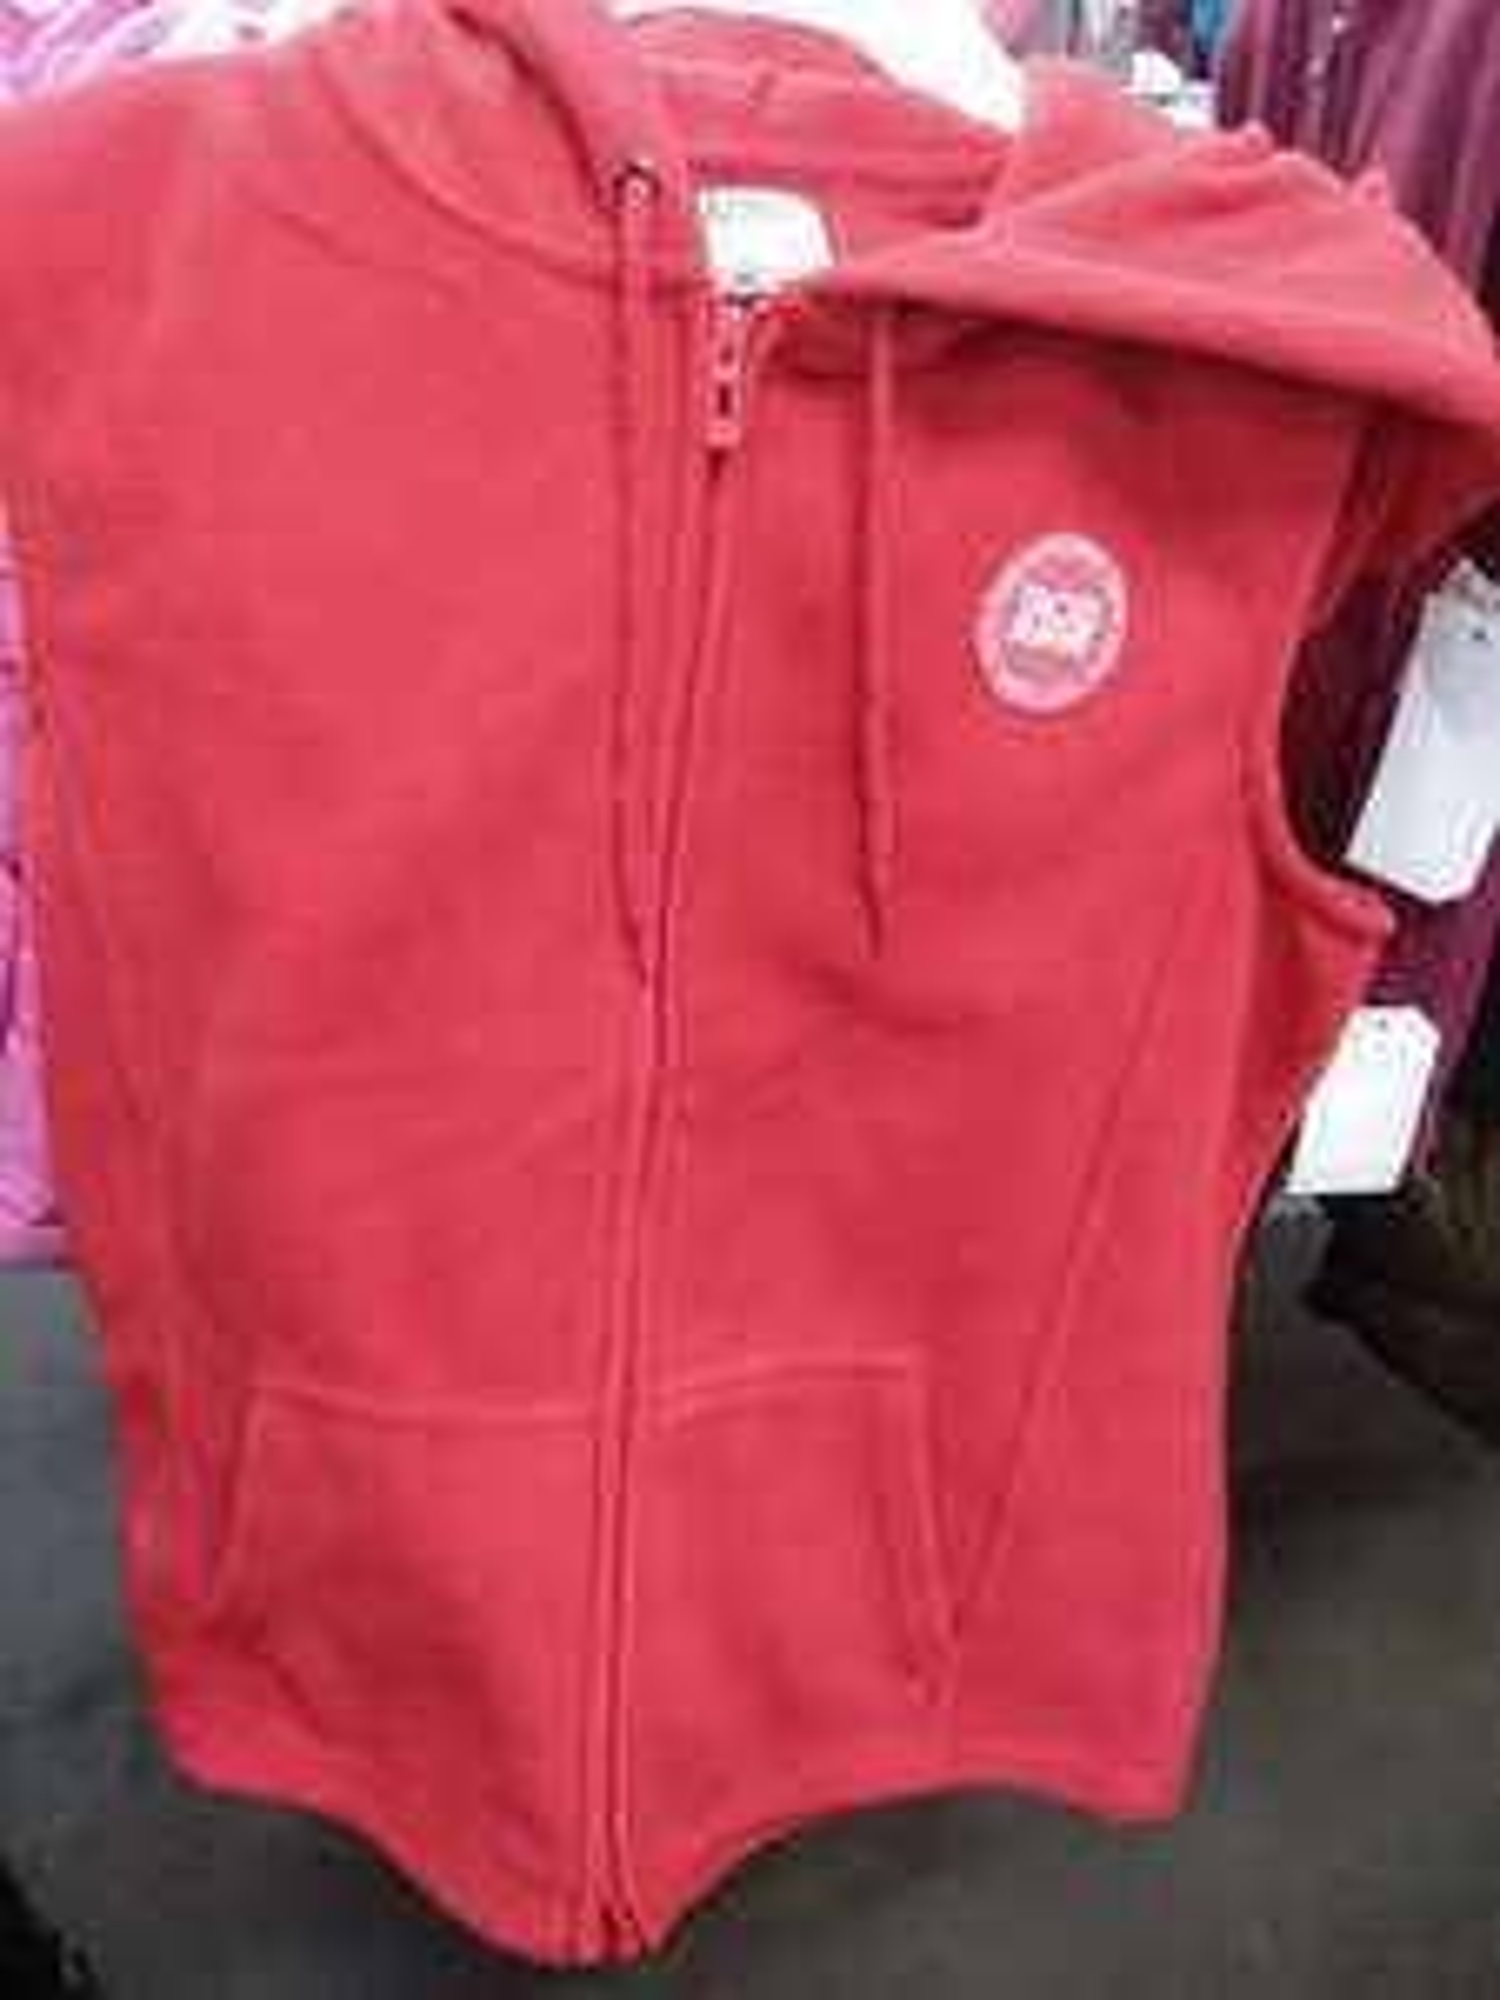 Walmart: chalecos y ropa térmica